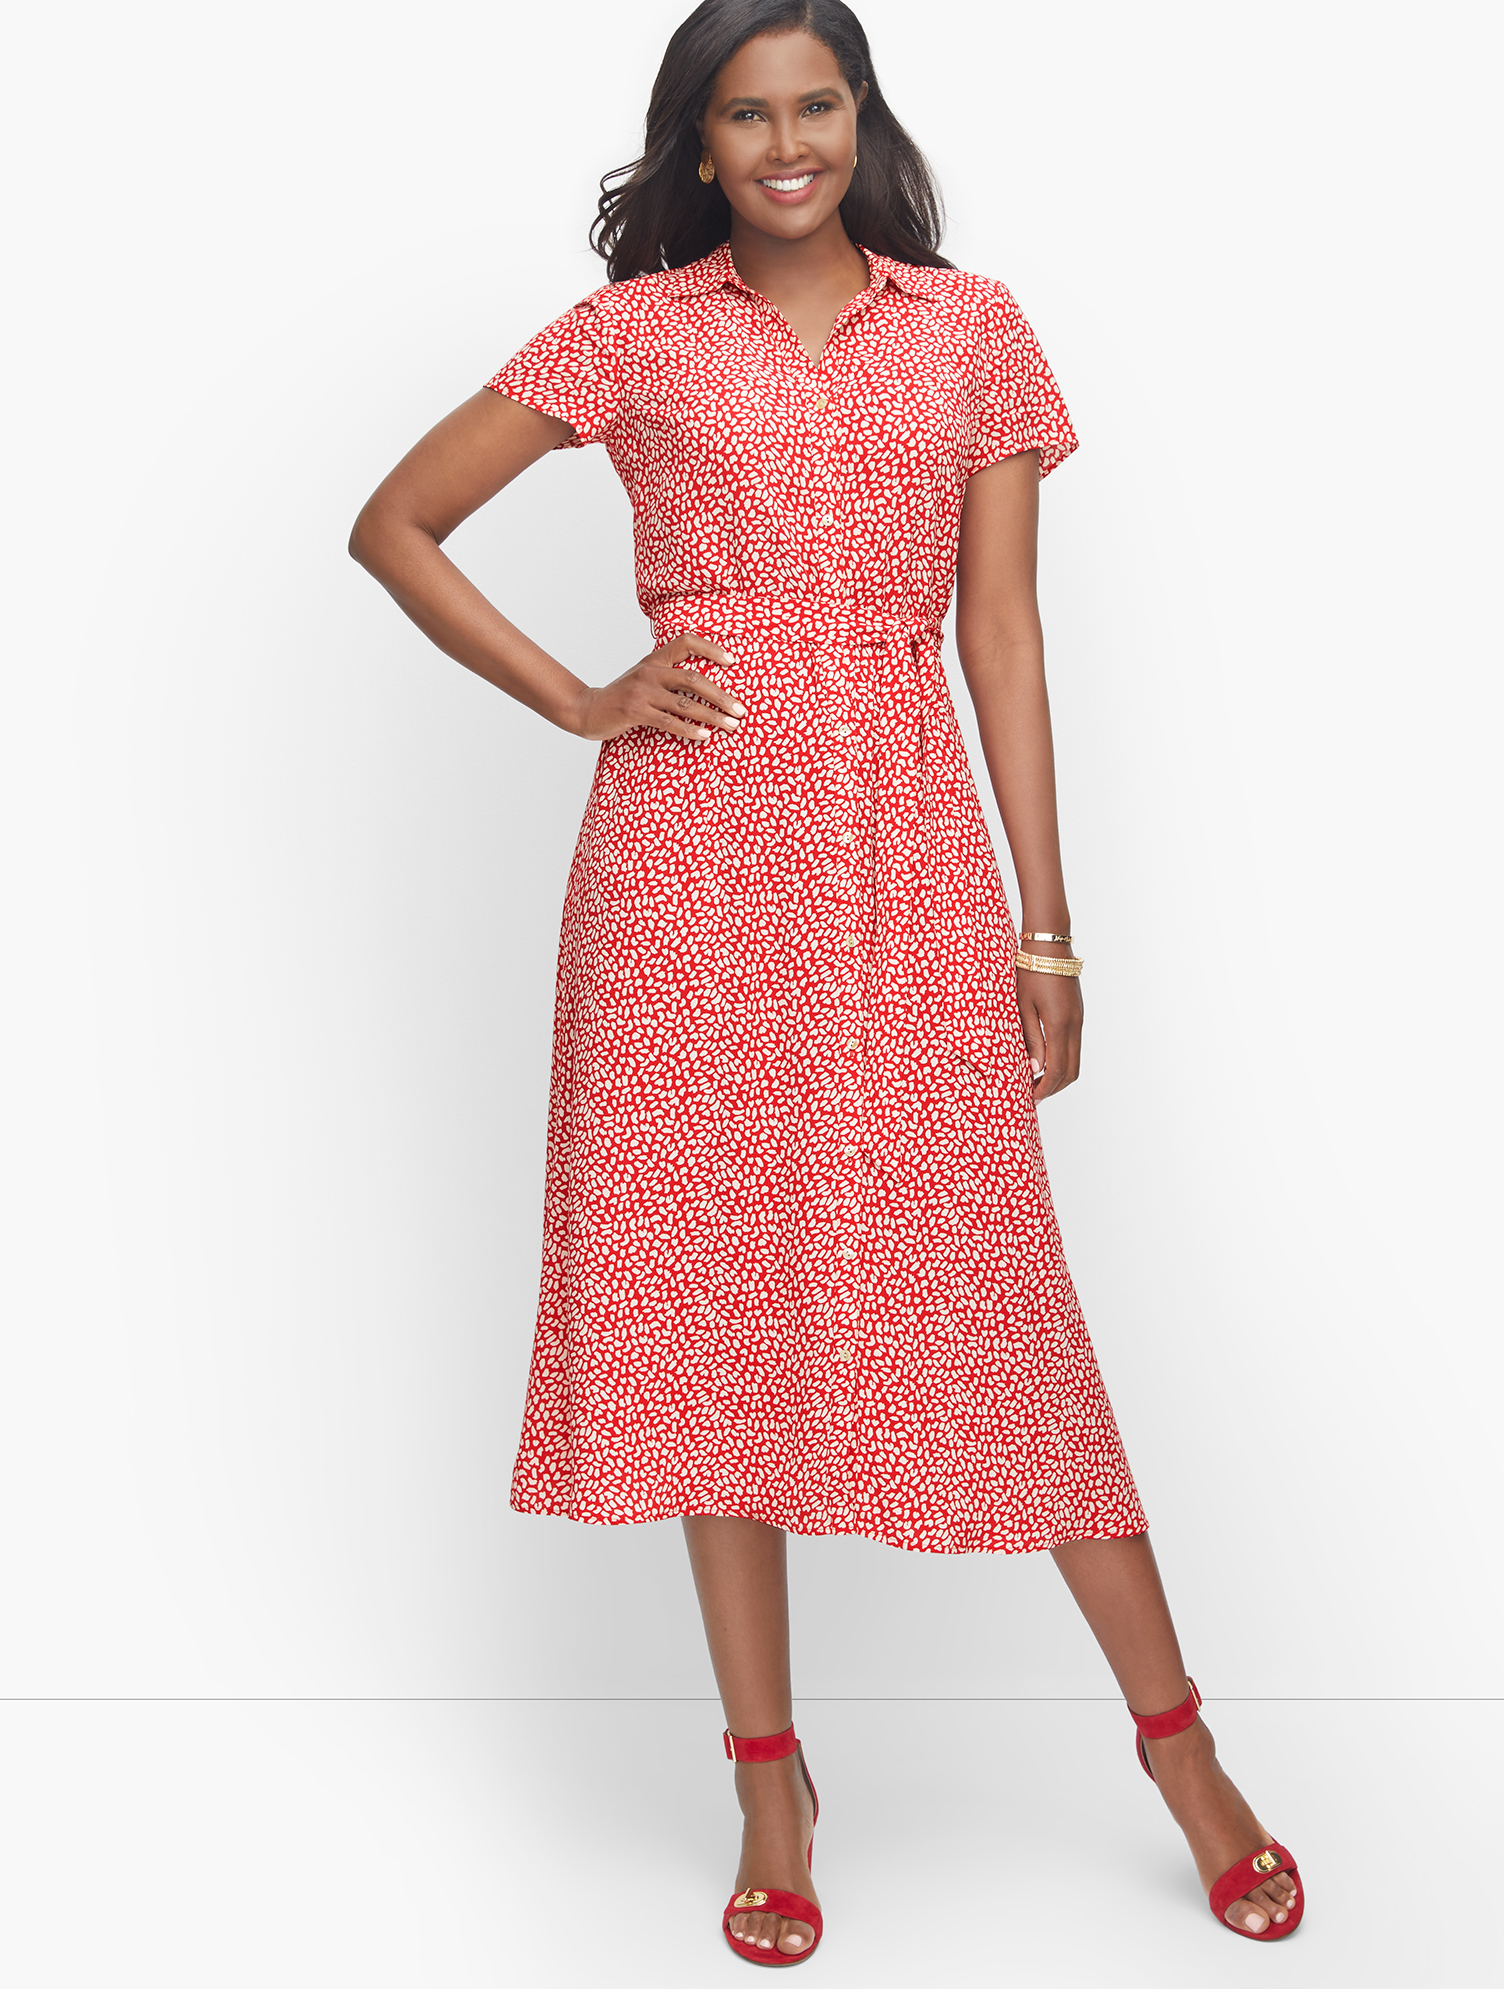 Modest, Mature, Mrs. Vintage Dresses – 20s, 30s, 40s, 50s, 60s Leopard Tie-Waist Midi Dress - RedWhite - 22 Talbots $119.99 AT vintagedancer.com